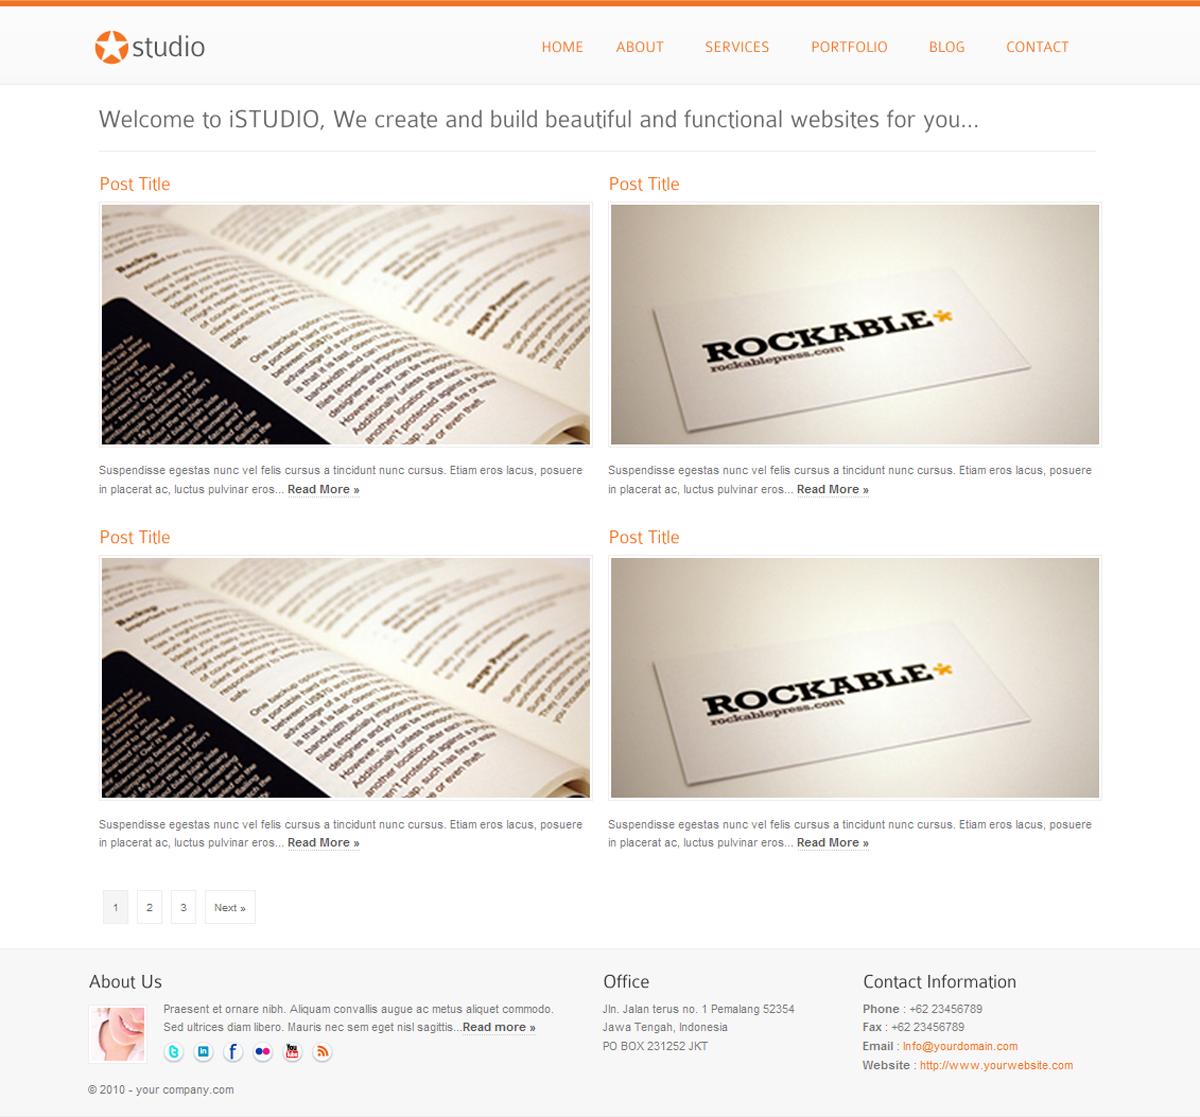 istudio - Clean and Minimalist Business Template - portfolio style 3 page